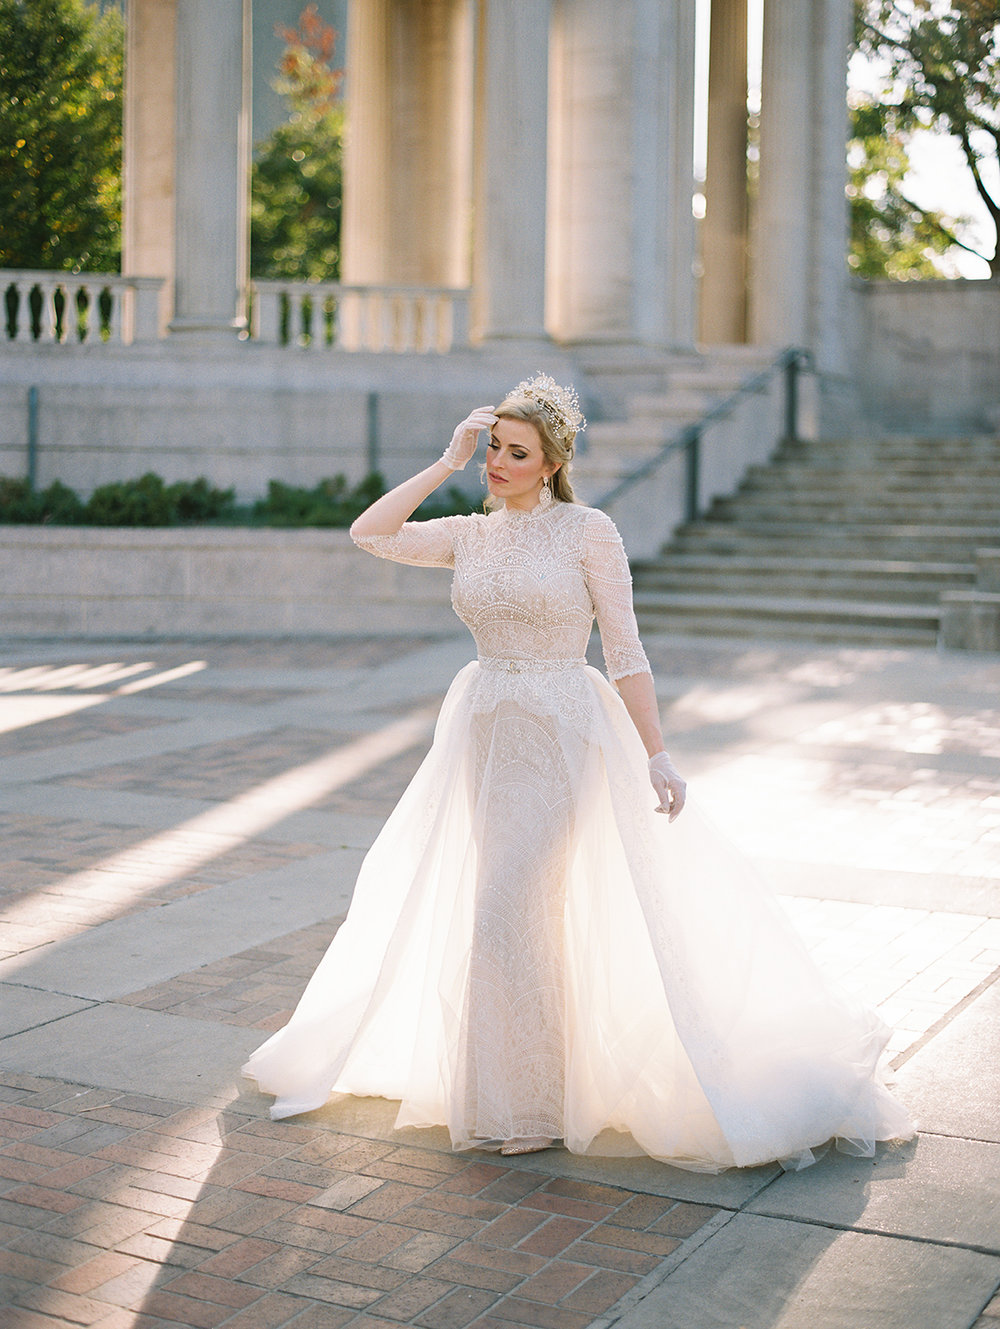 370Tommy+Jillian-fine-art-film-photorapher-california-colorado-destination-weddings-brumley-&-wells copy.jpg